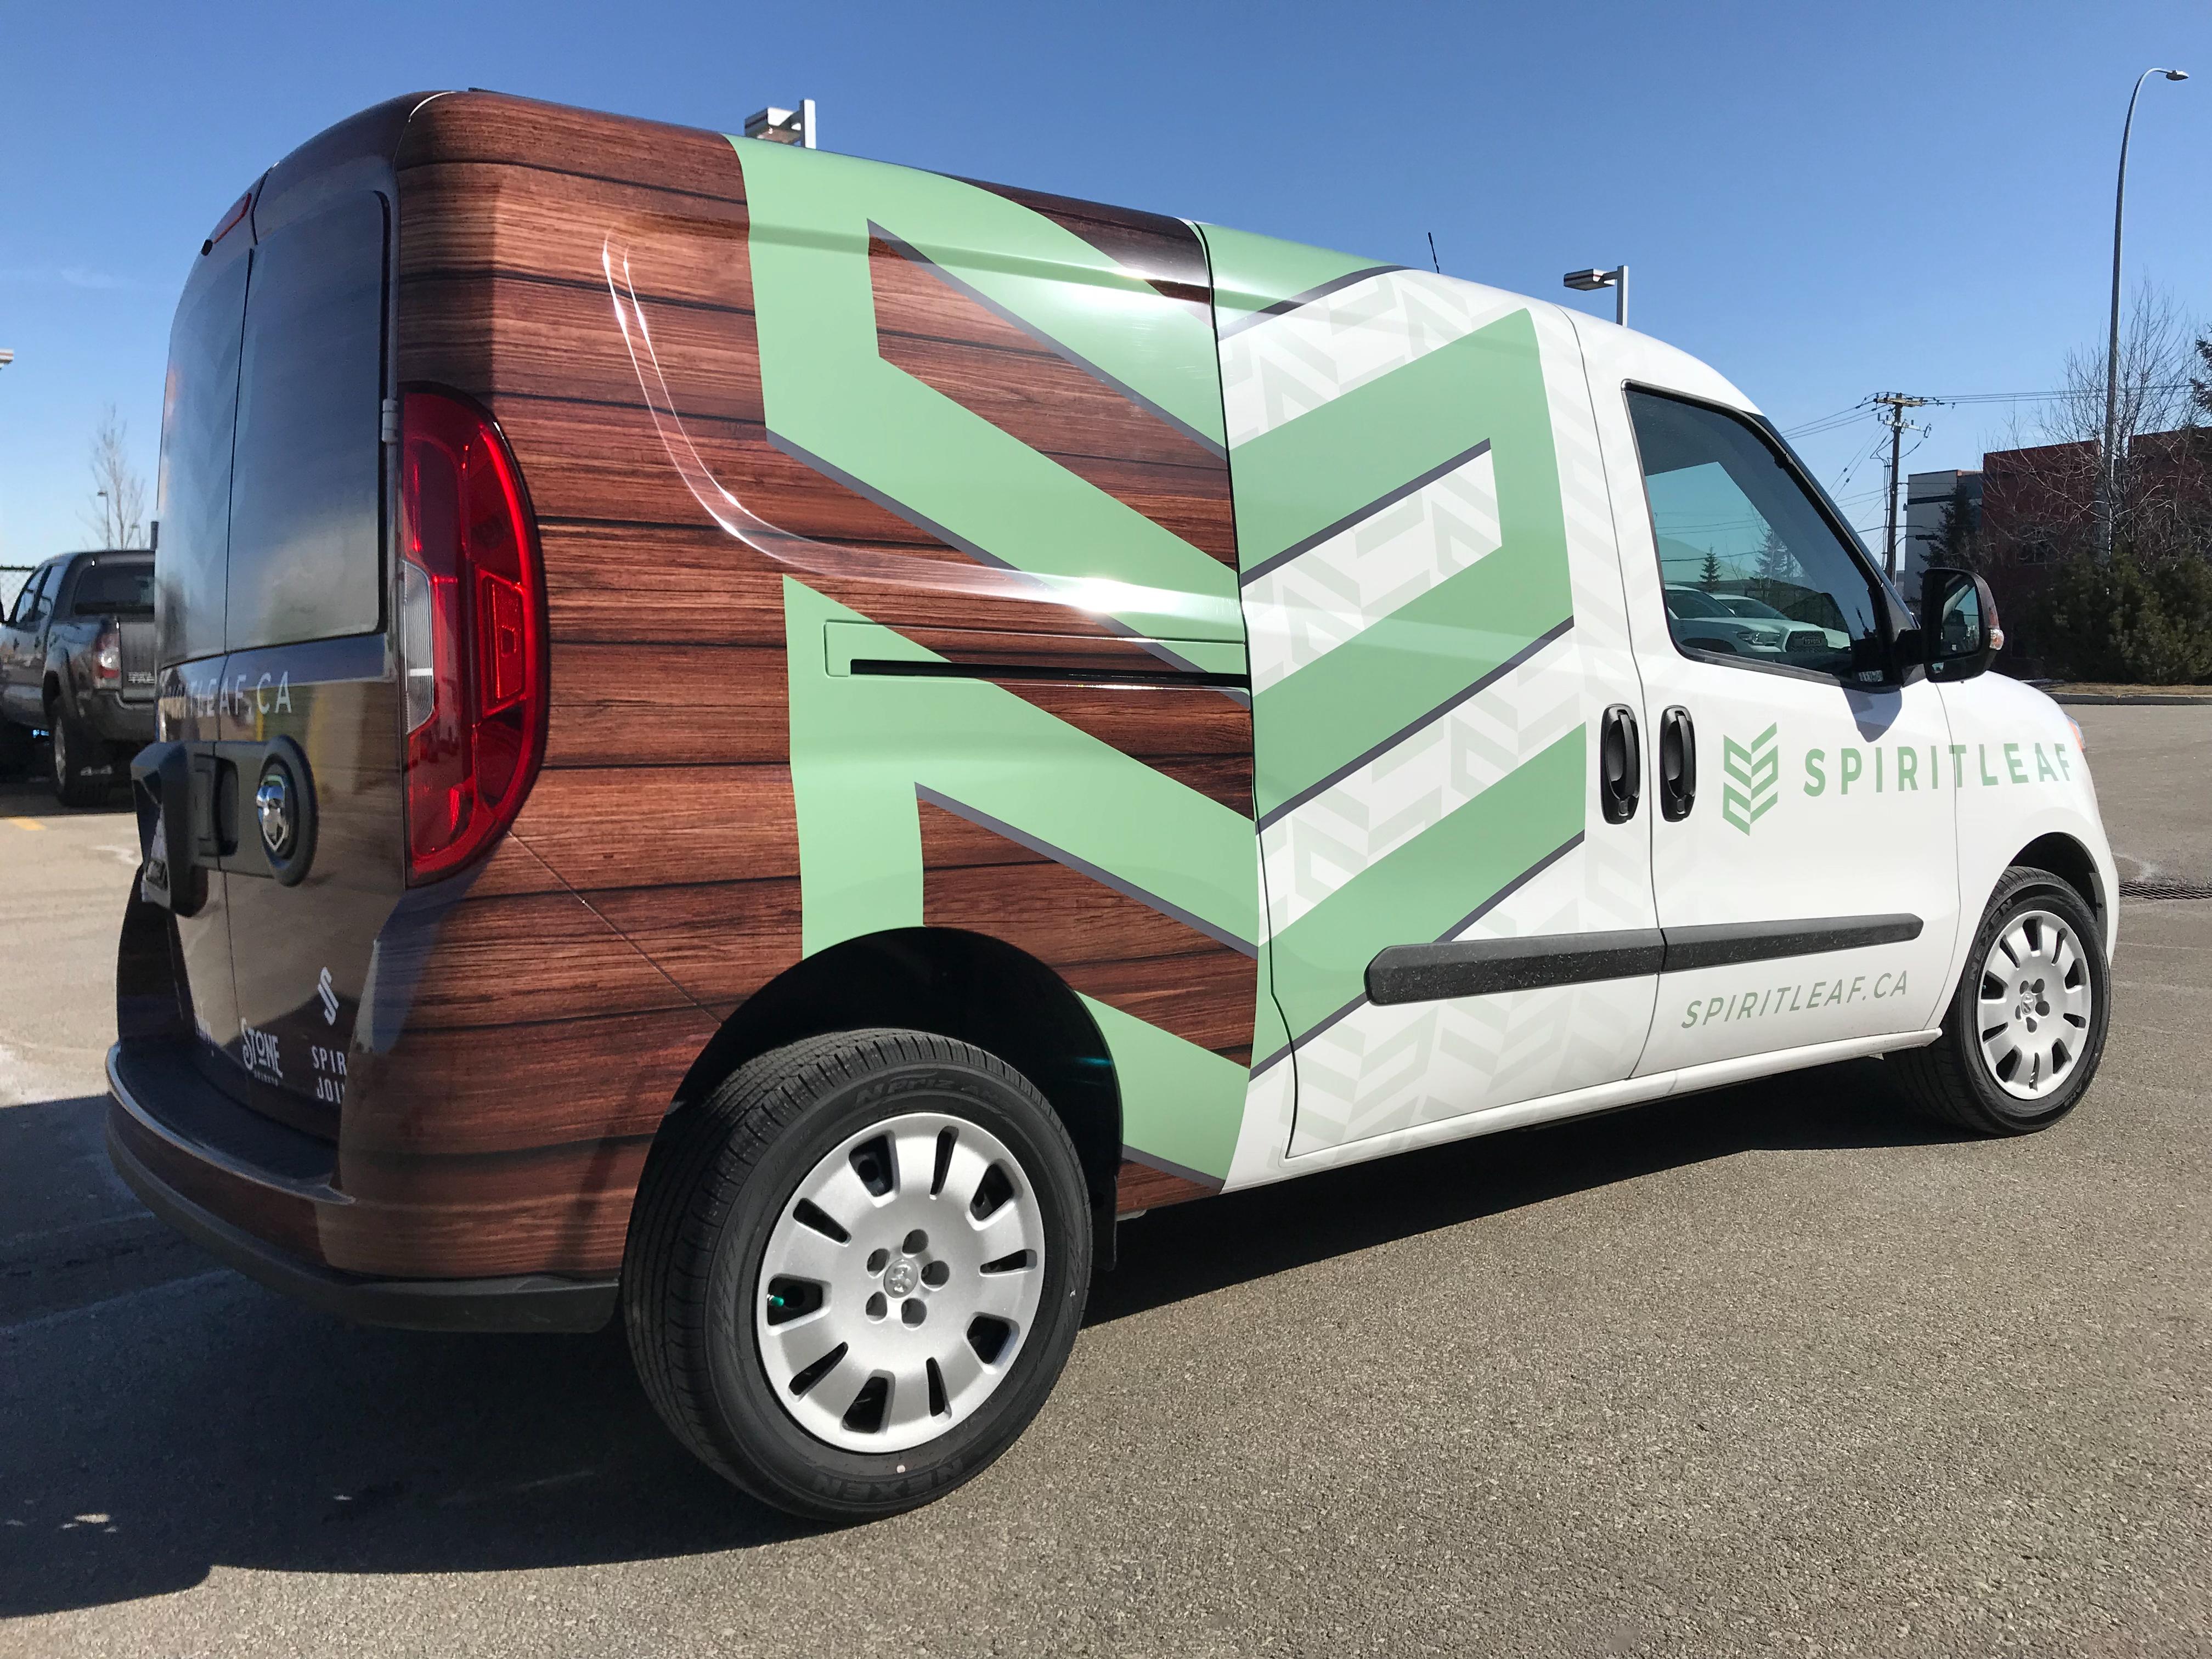 Spirit Leaf full vehicle wrap